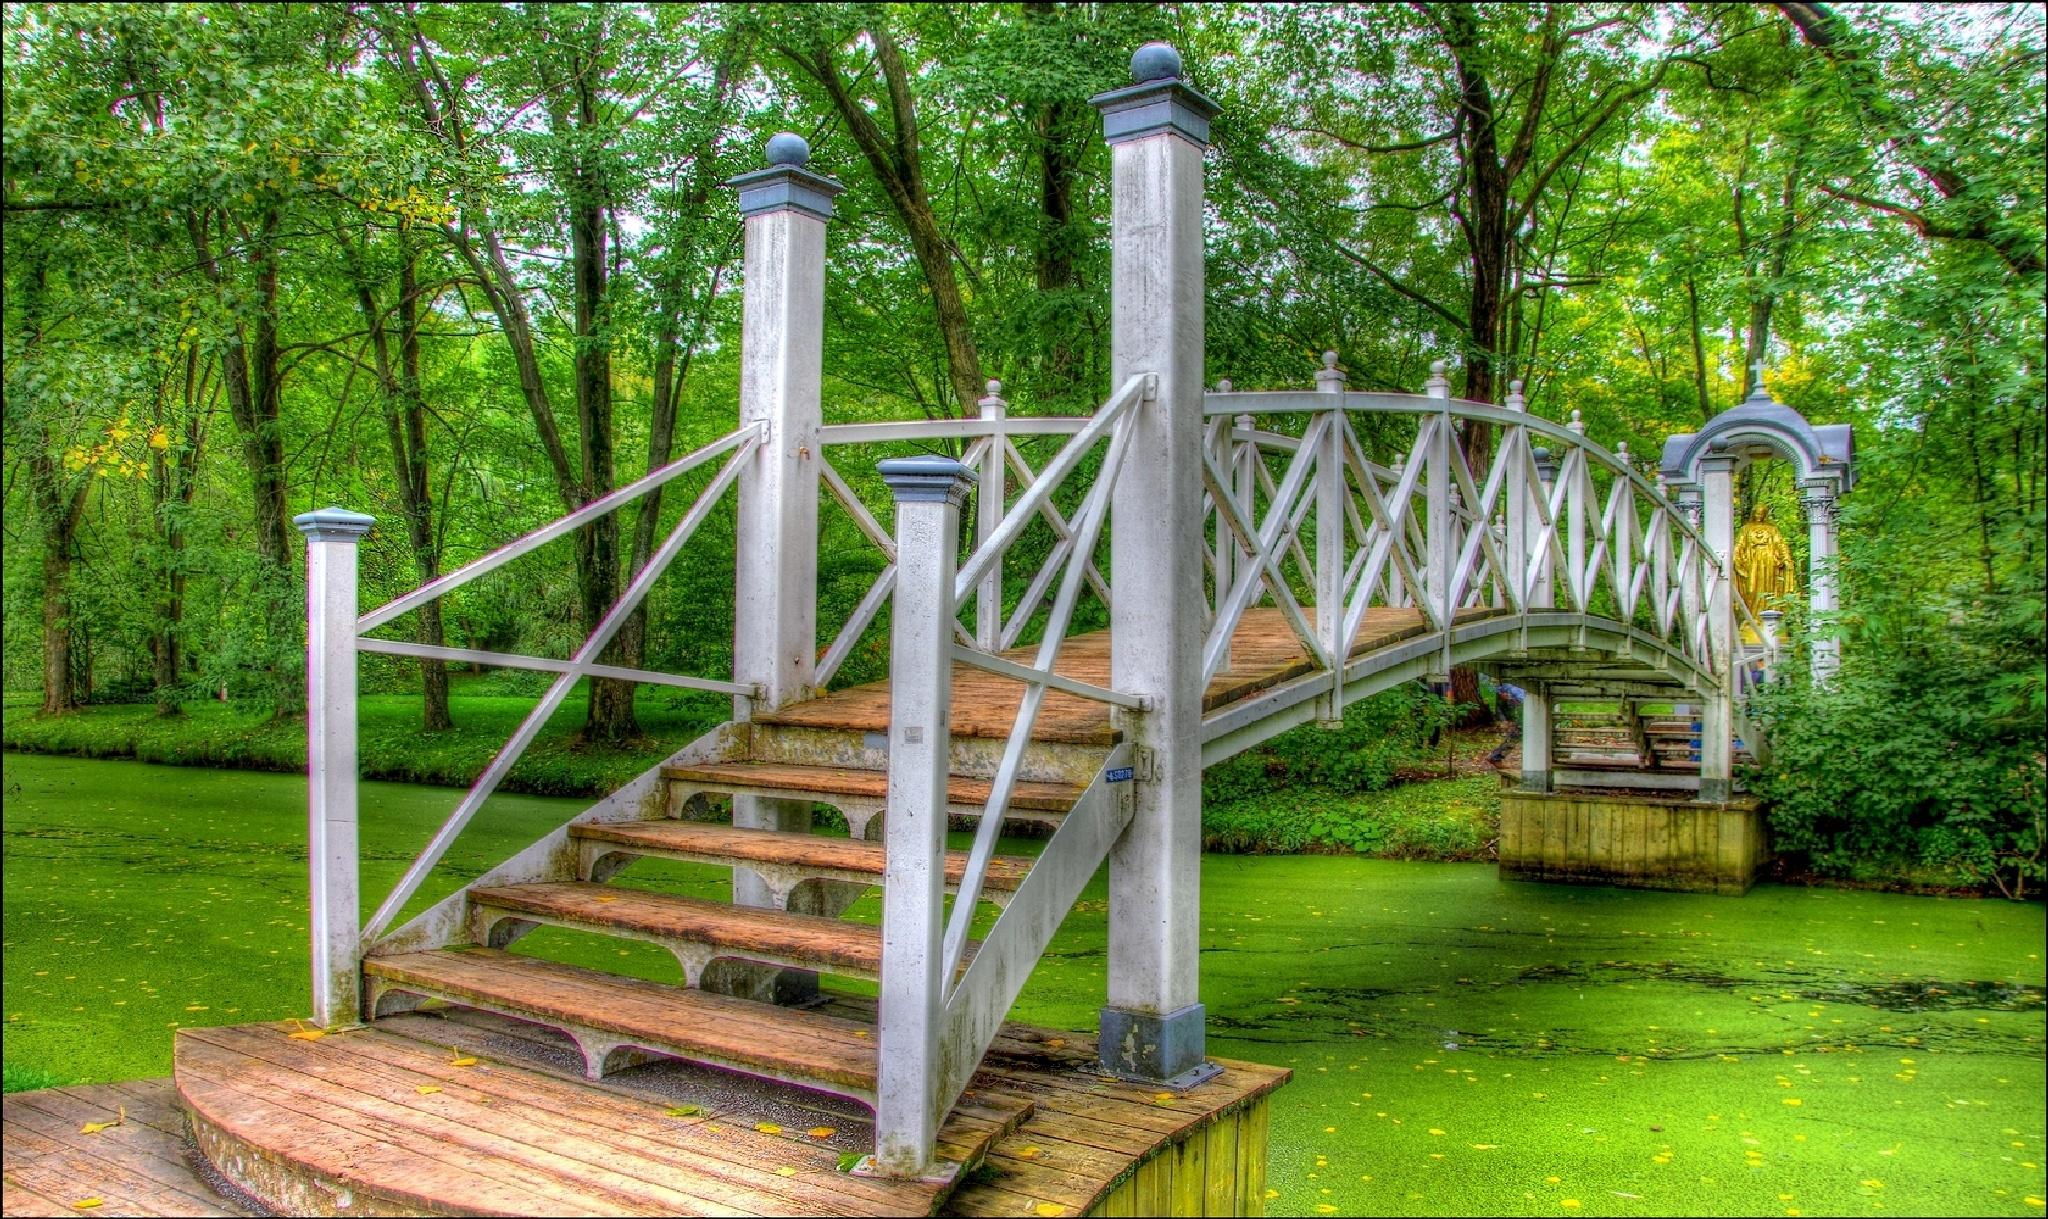 Le petit pont by Fernand Larochelle